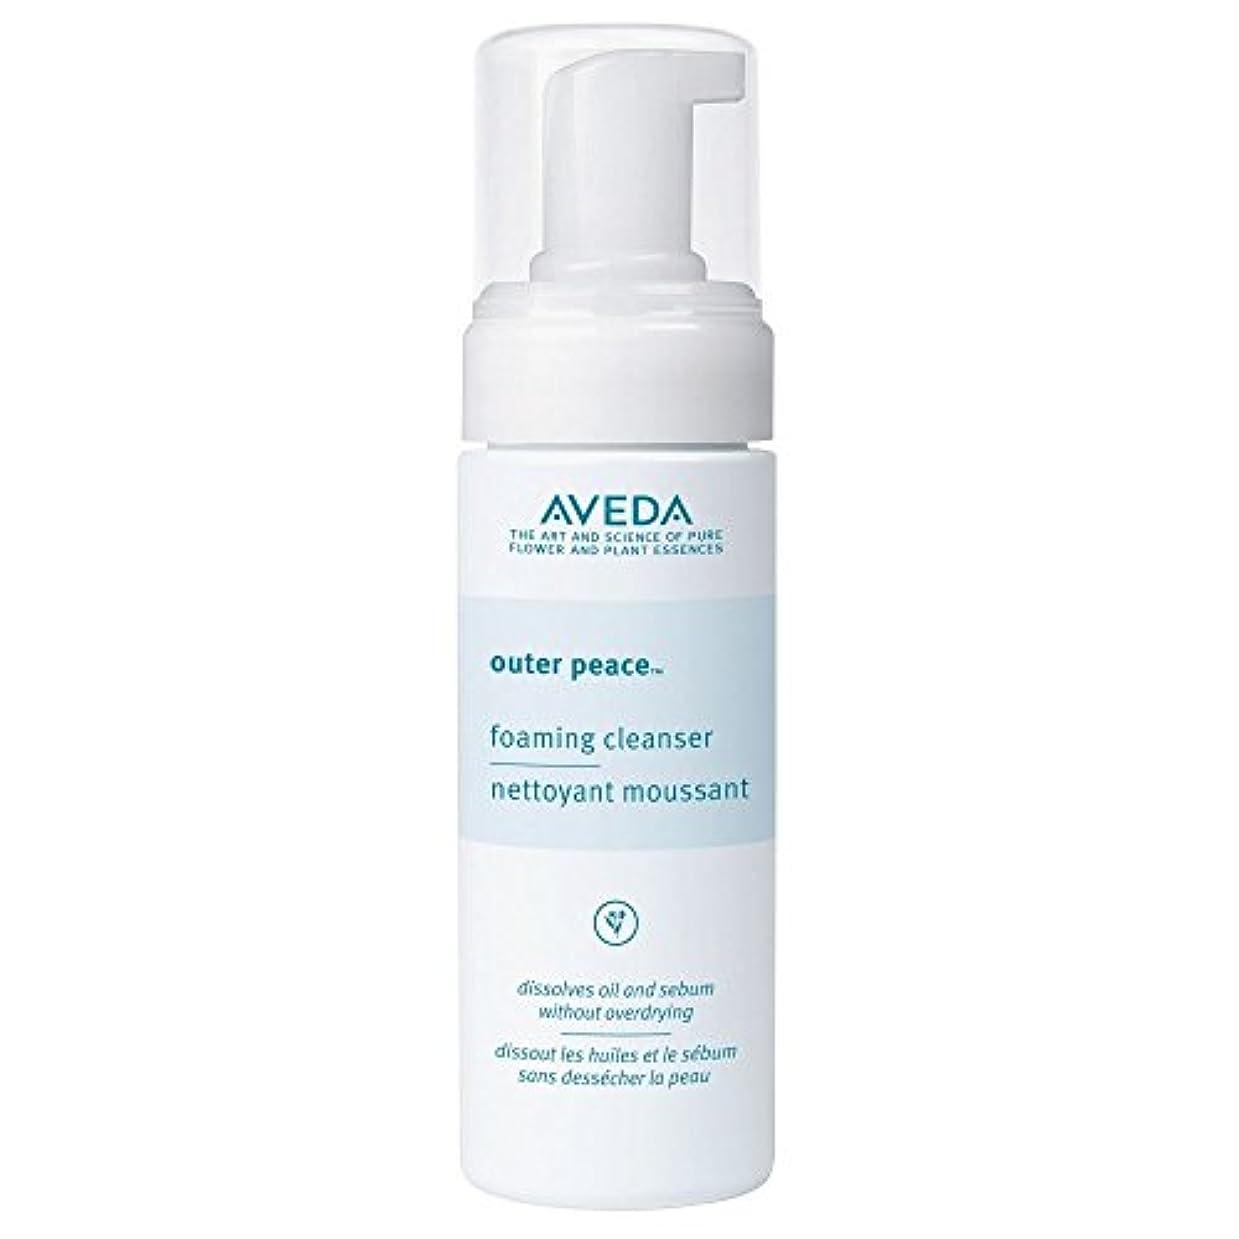 [AVEDA] アヴェダ外平和フォーミングクレンザー、125ミリリットル - Aveda Outer Peace Foaming Cleanser, 125ml [並行輸入品]